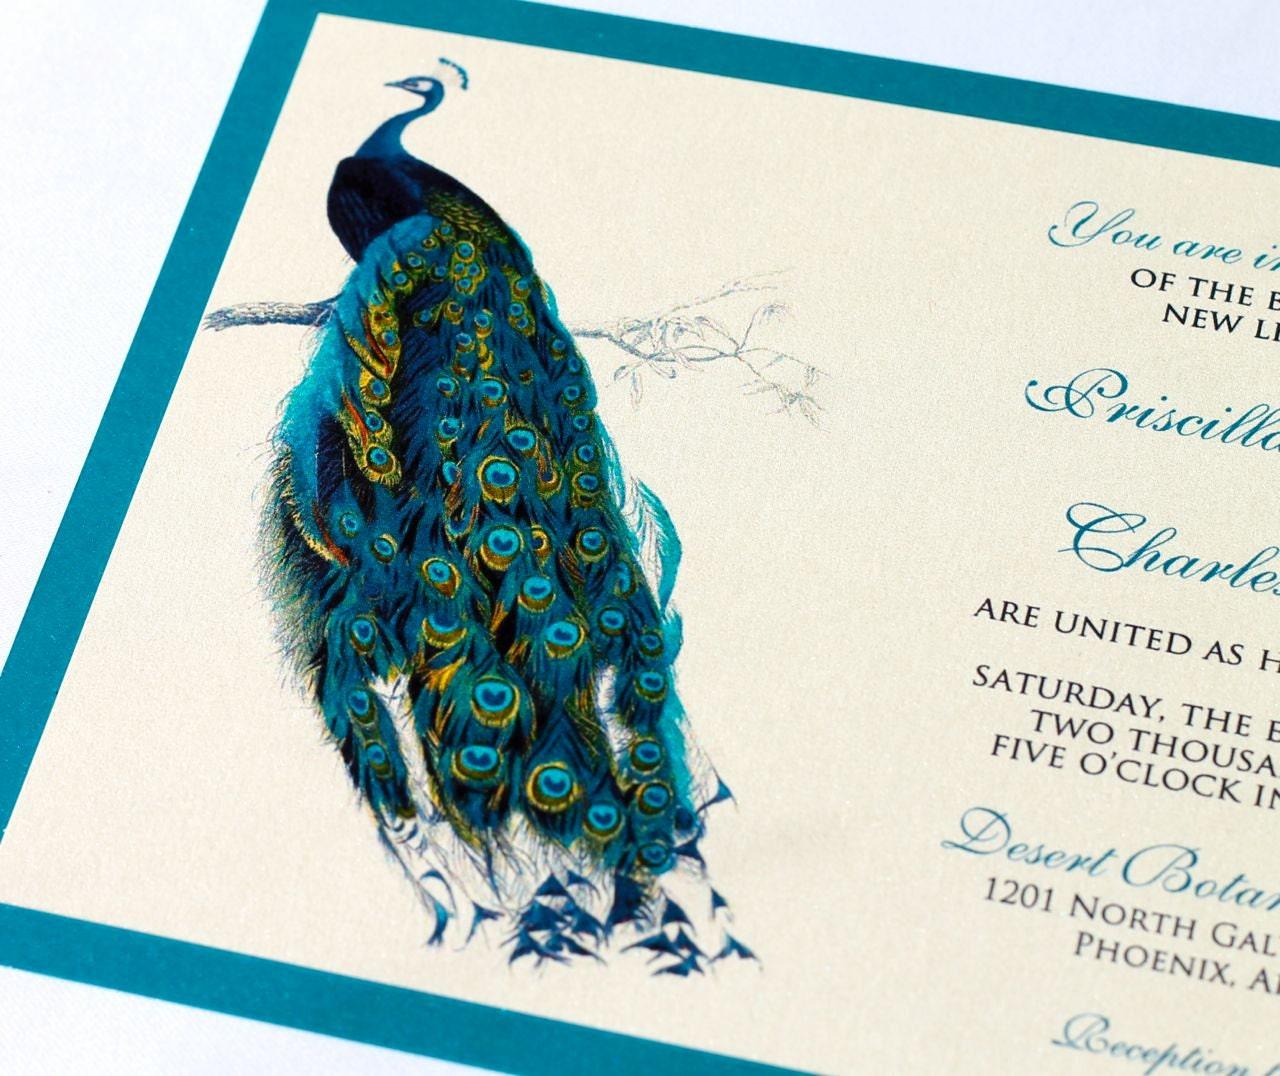 Peacock Wedding Invitations: Priscilla Peacock Wedding Invitation Sample Ivory Ecru